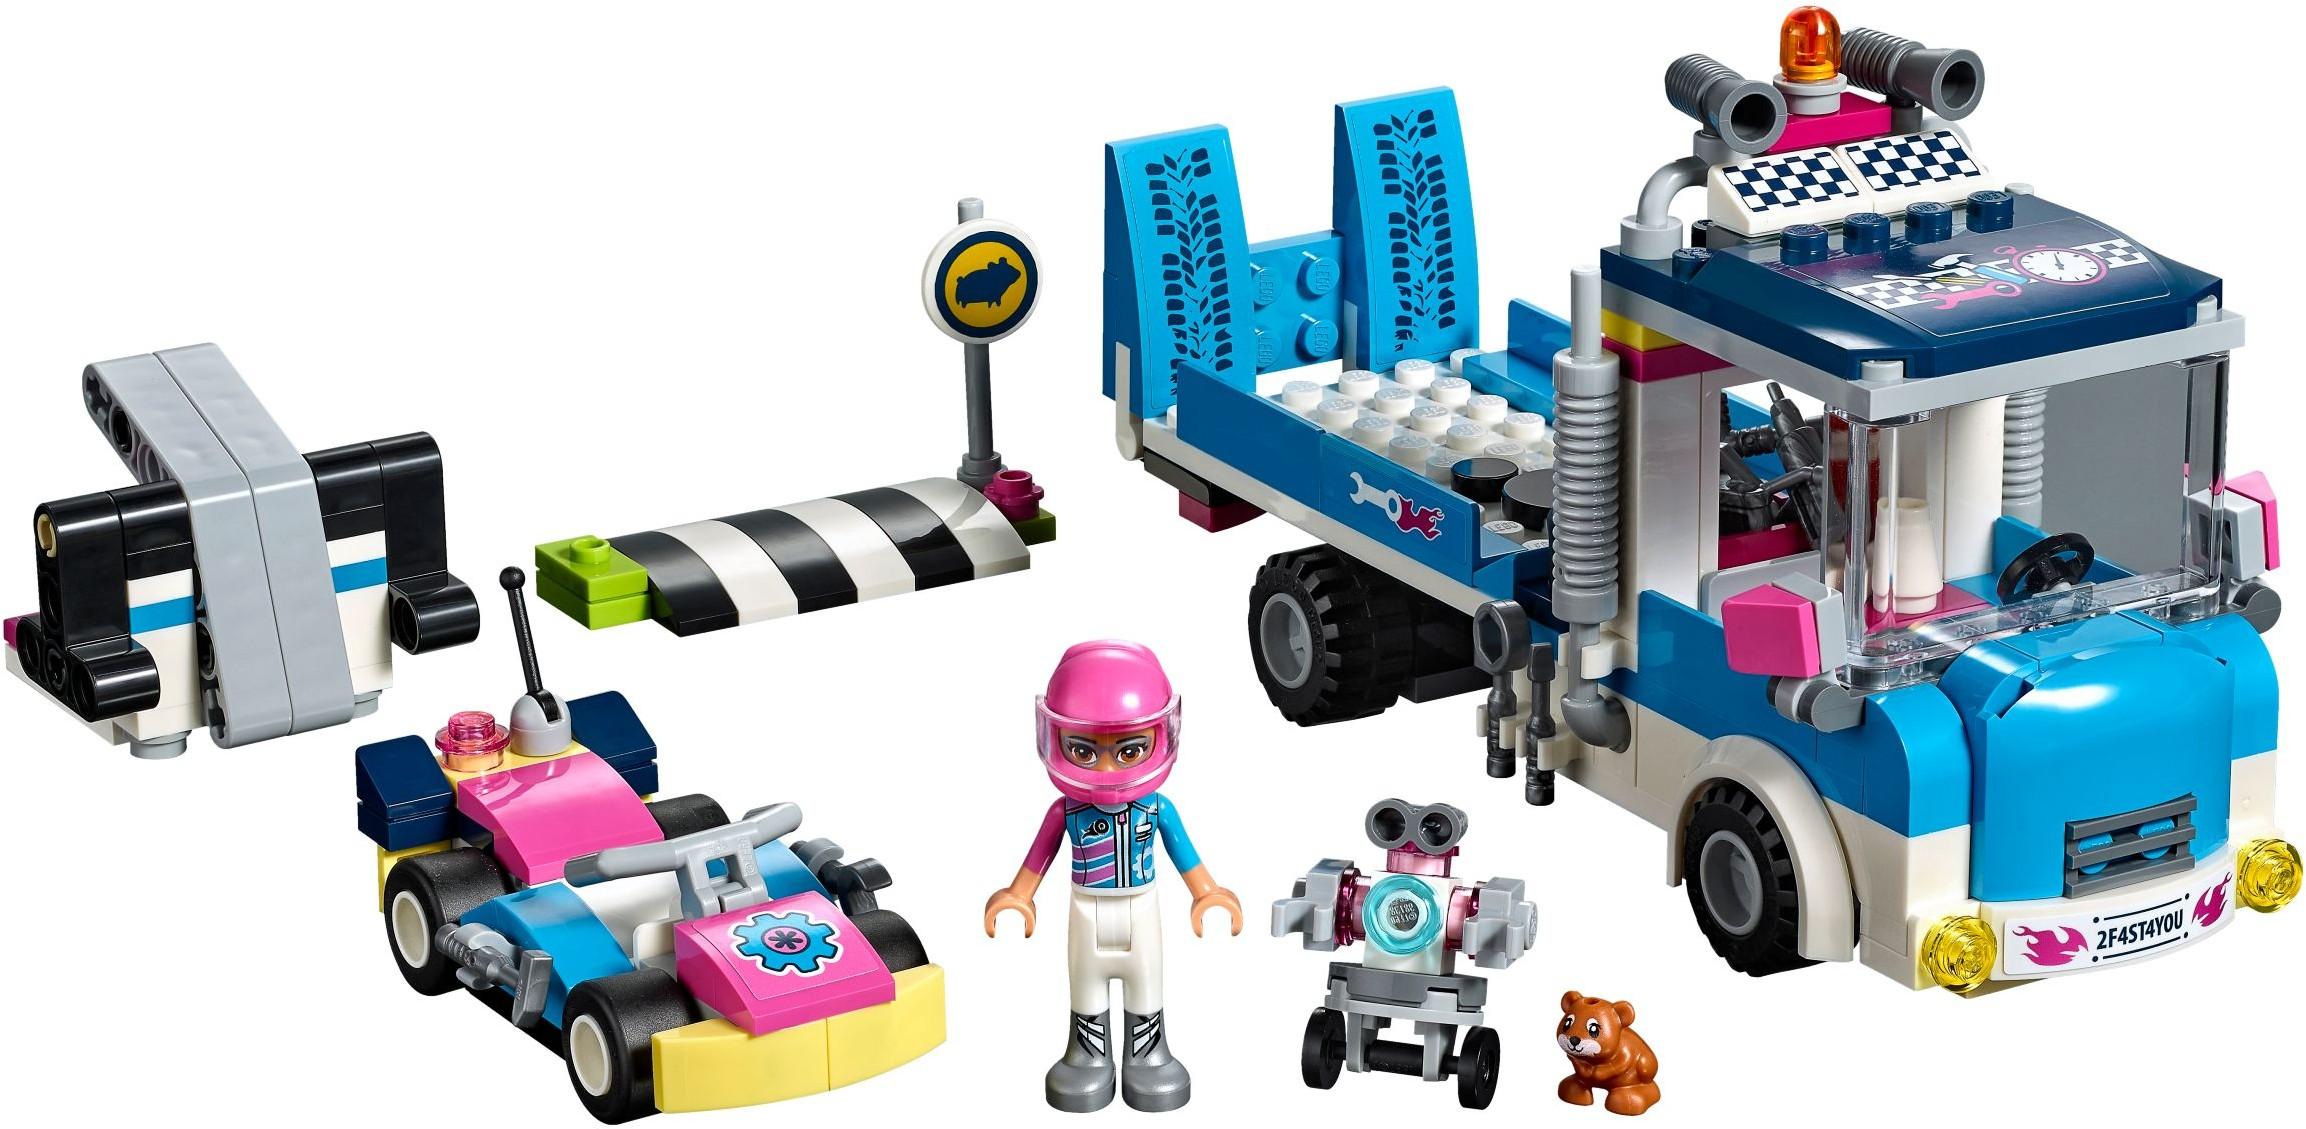 Friends | 2018 | Brickset: LEGO set guide and database